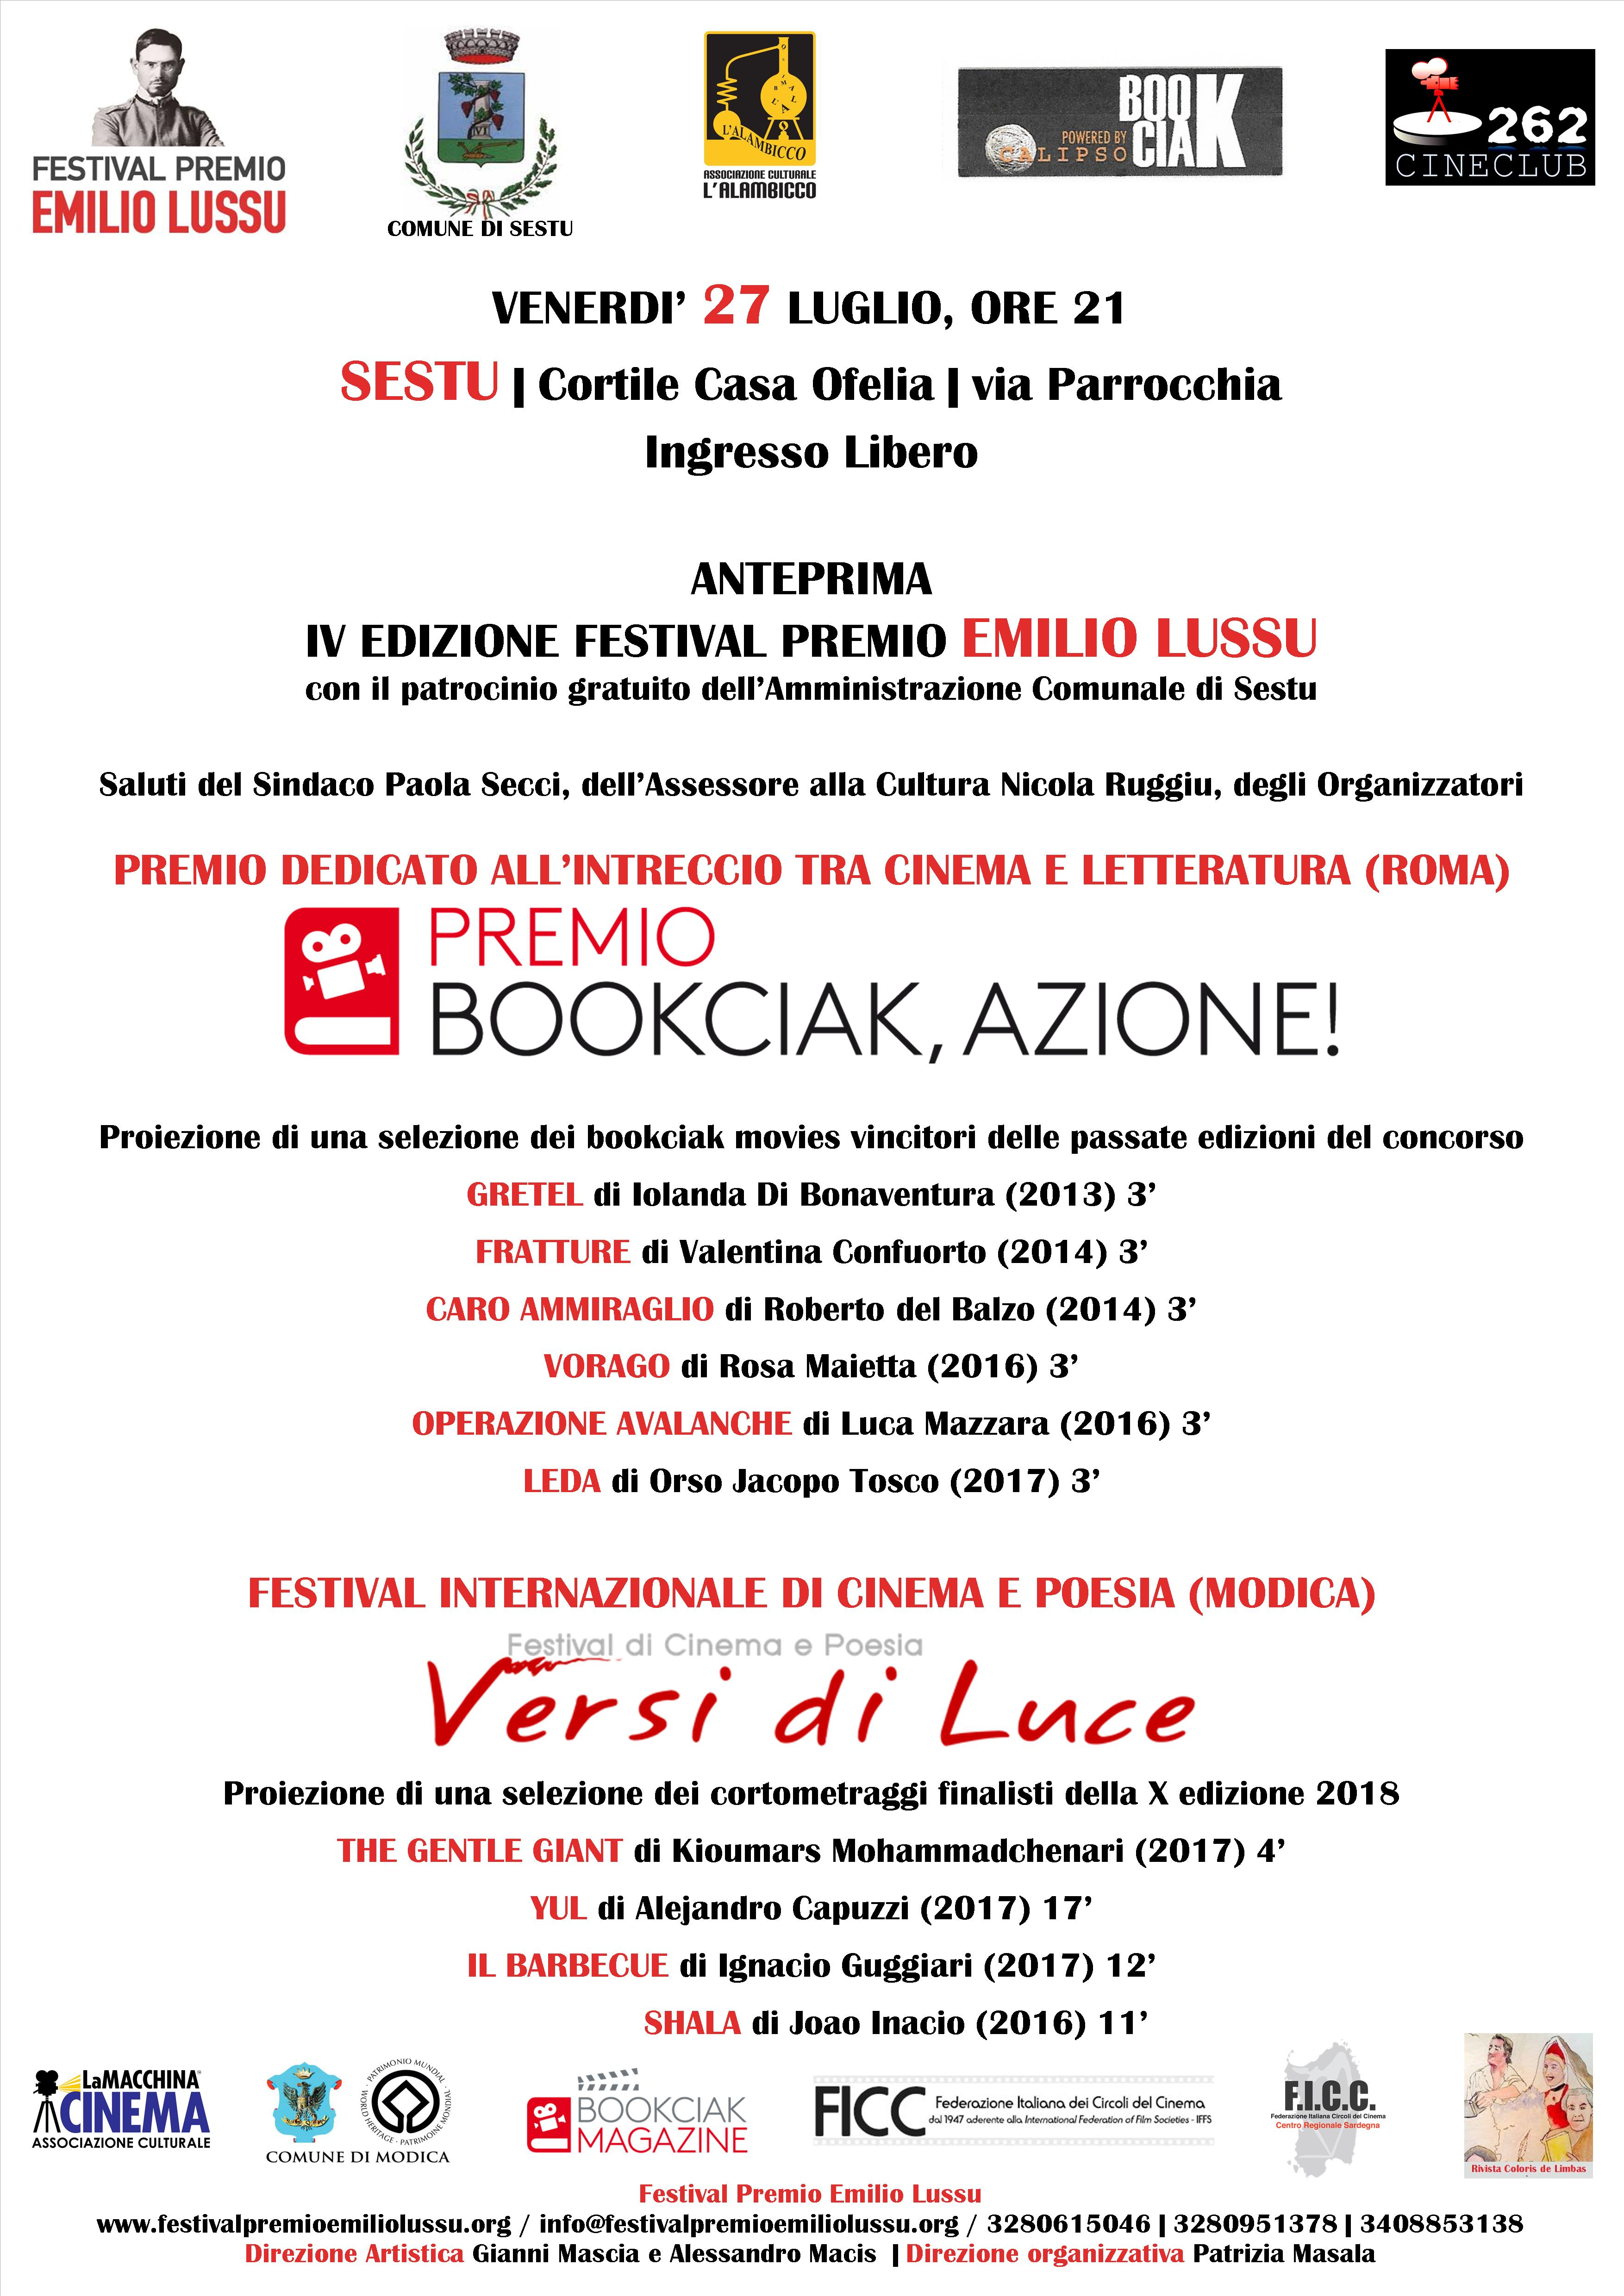 Sestu. Anteprima Festival Premio Emilio Lussu – IV Edizione